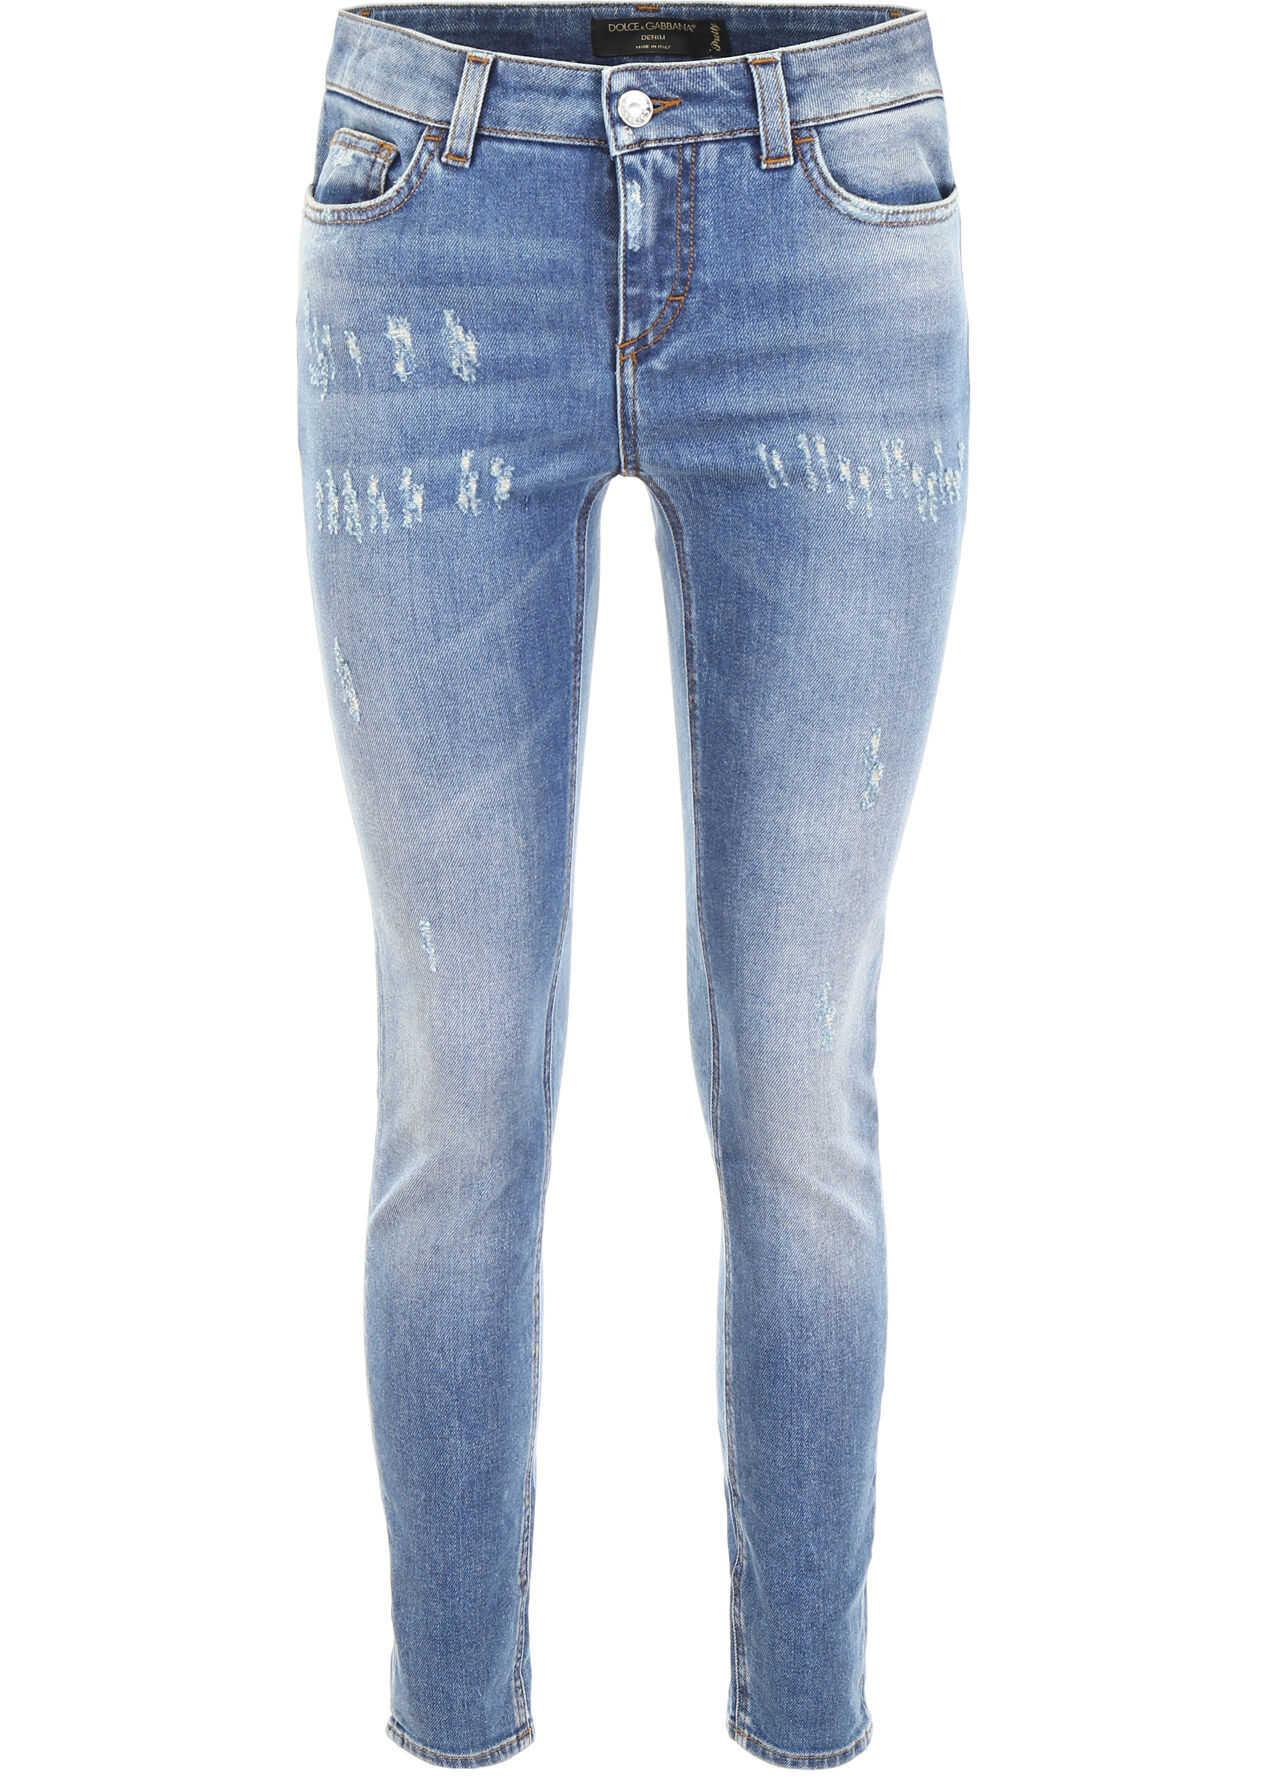 Pretty Fit Jeans